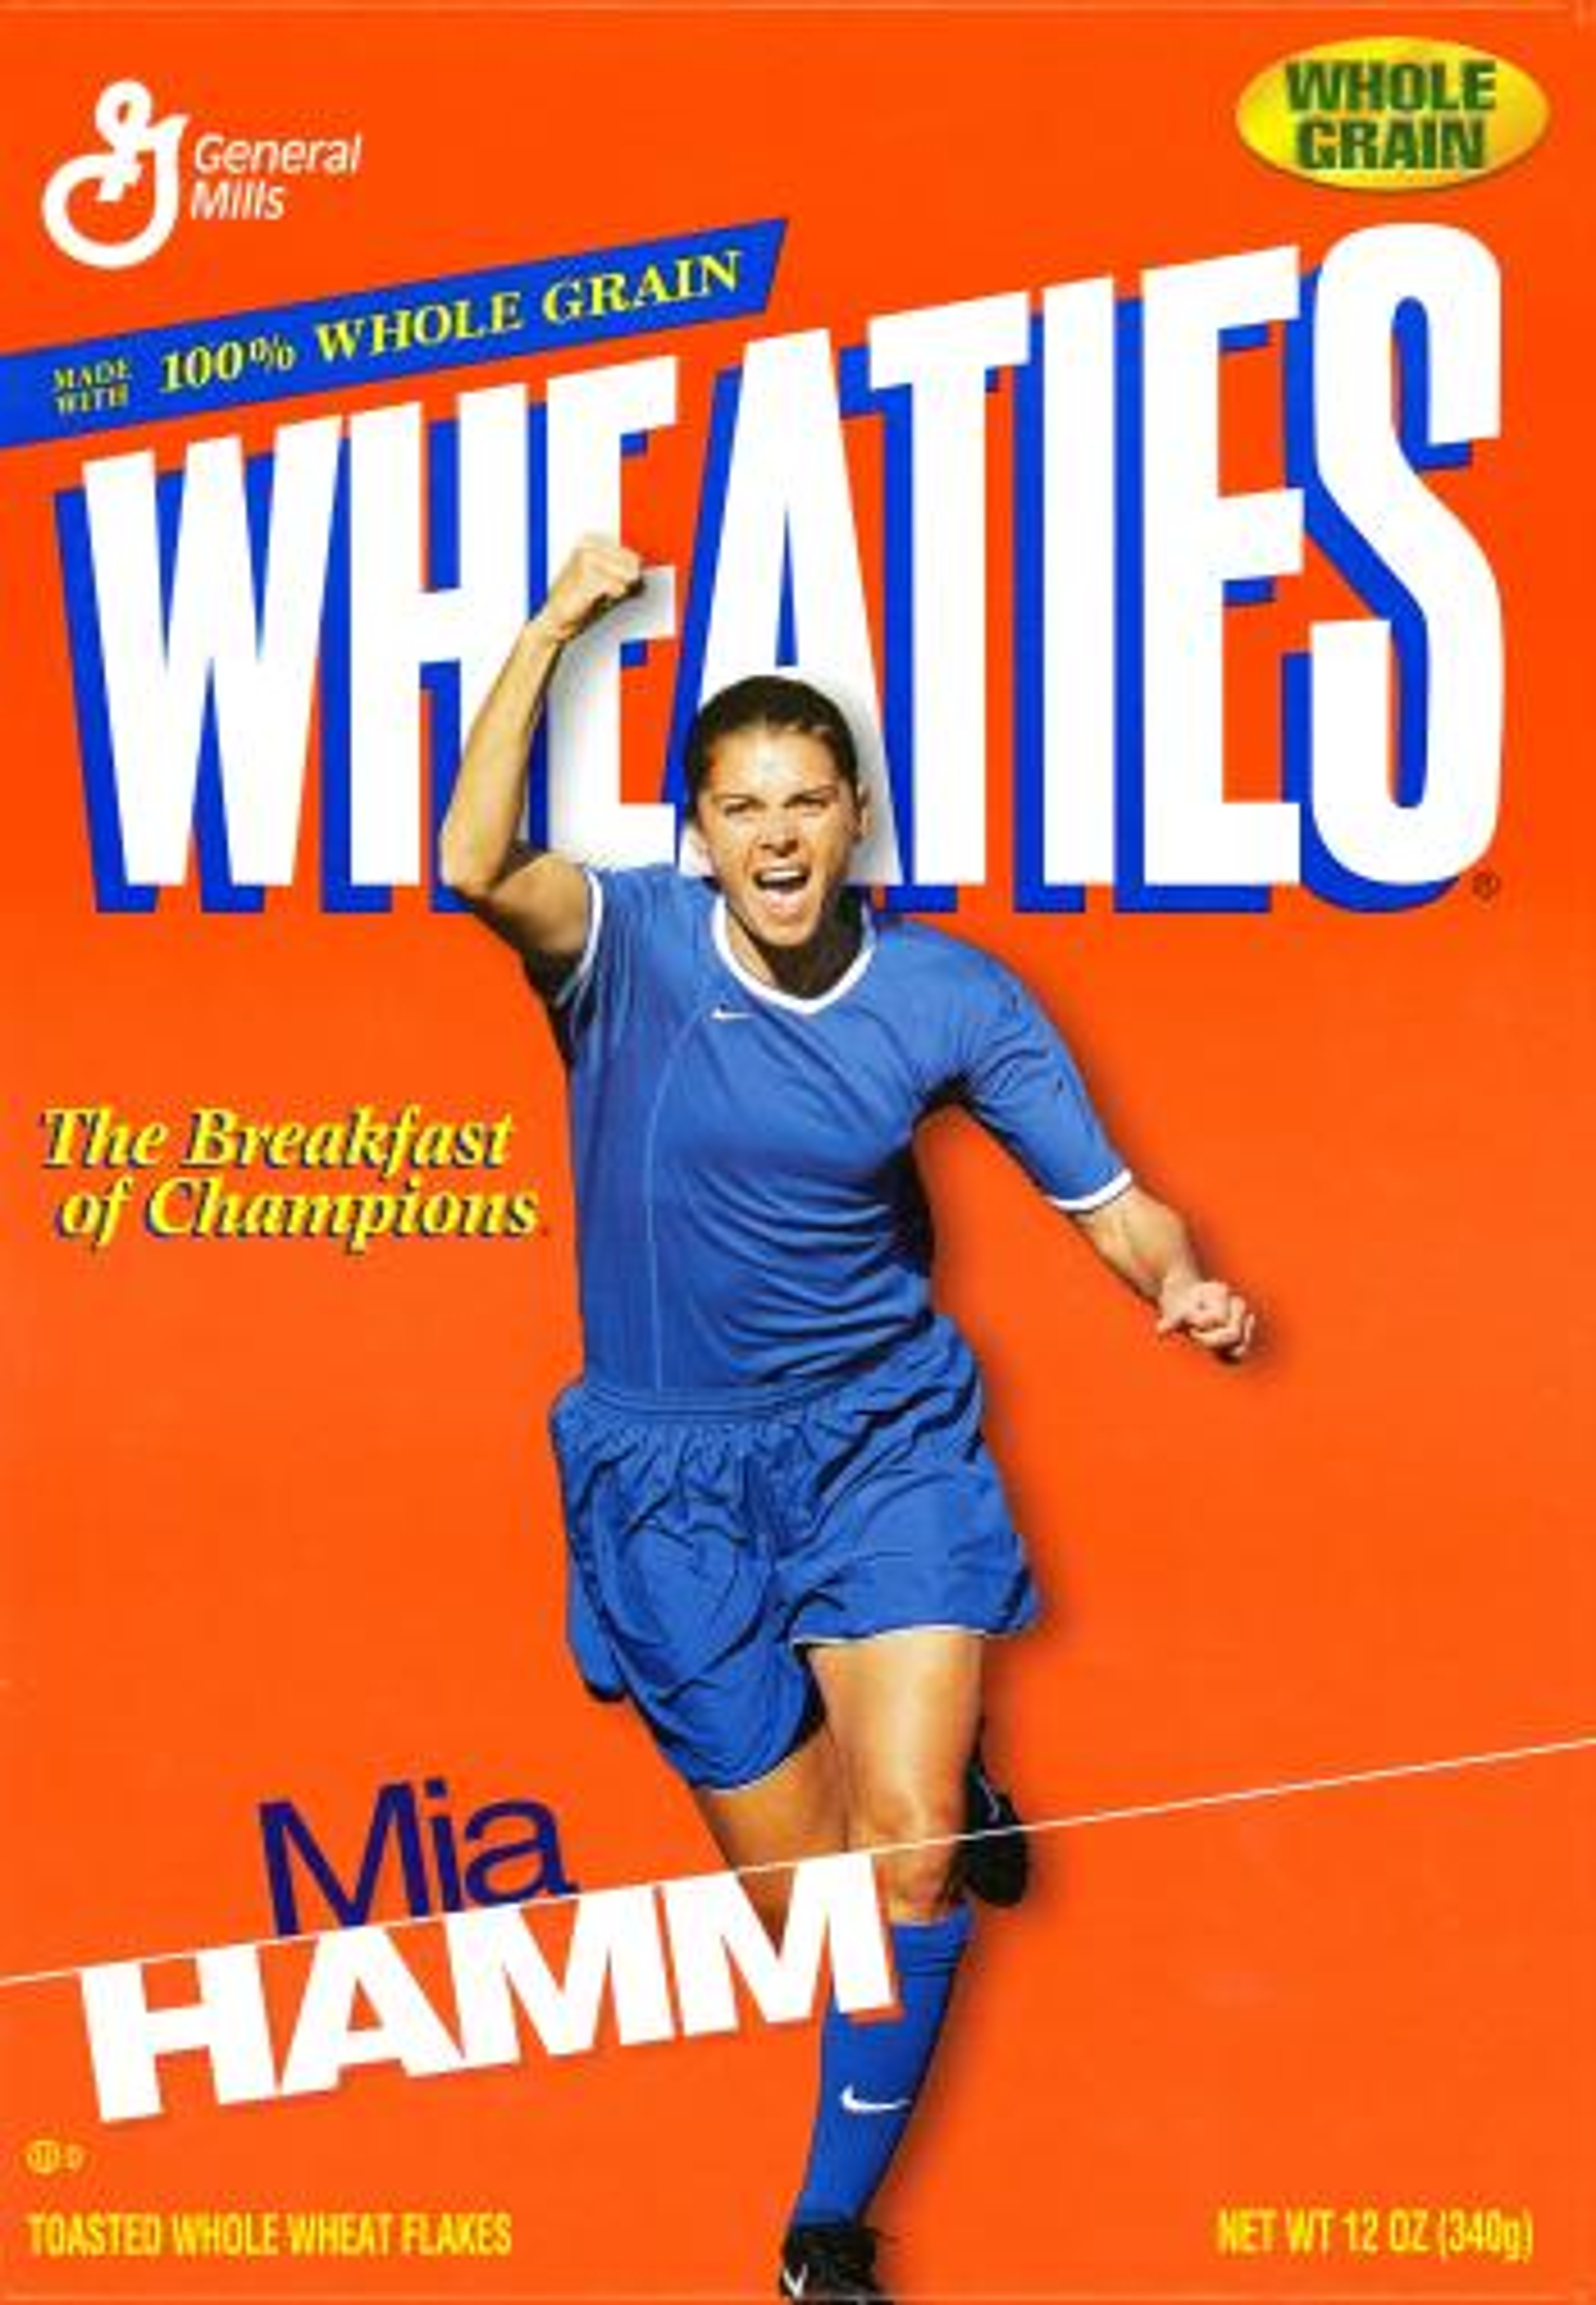 Mia Hamm on the Wheaties box.